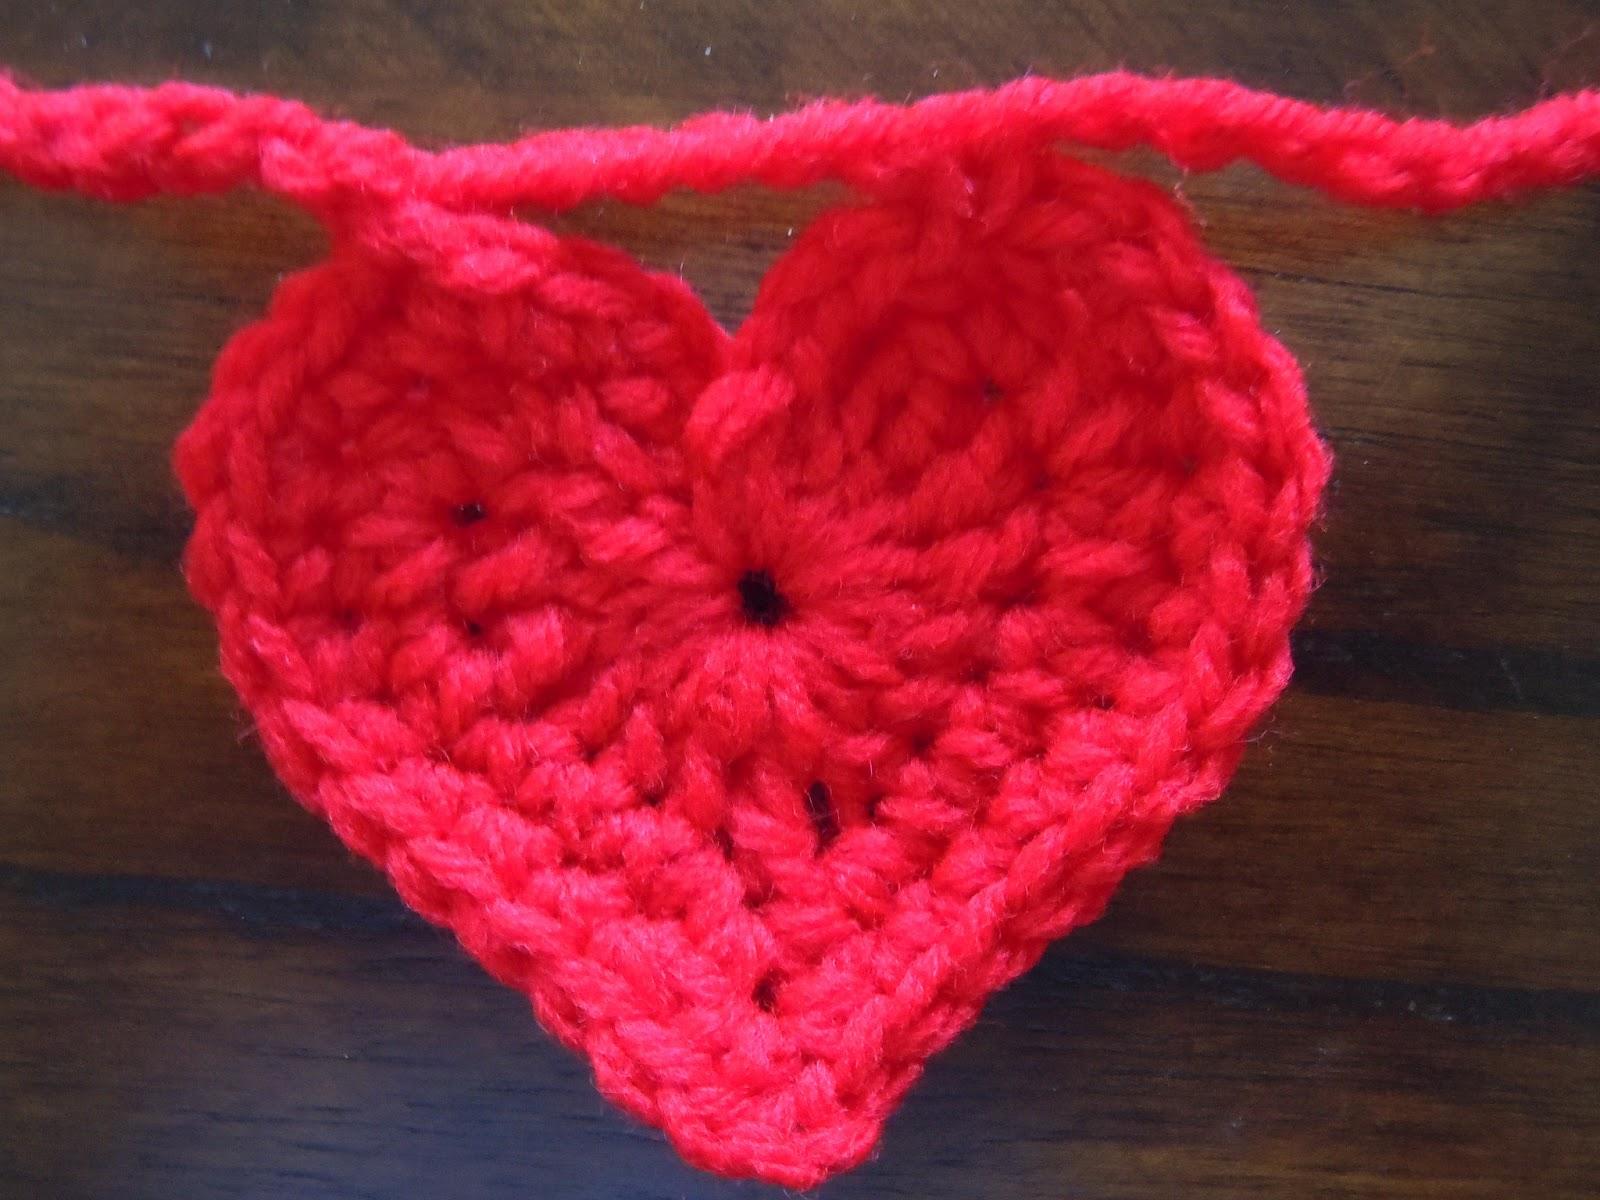 Illuminate Crochet: Heart Garland